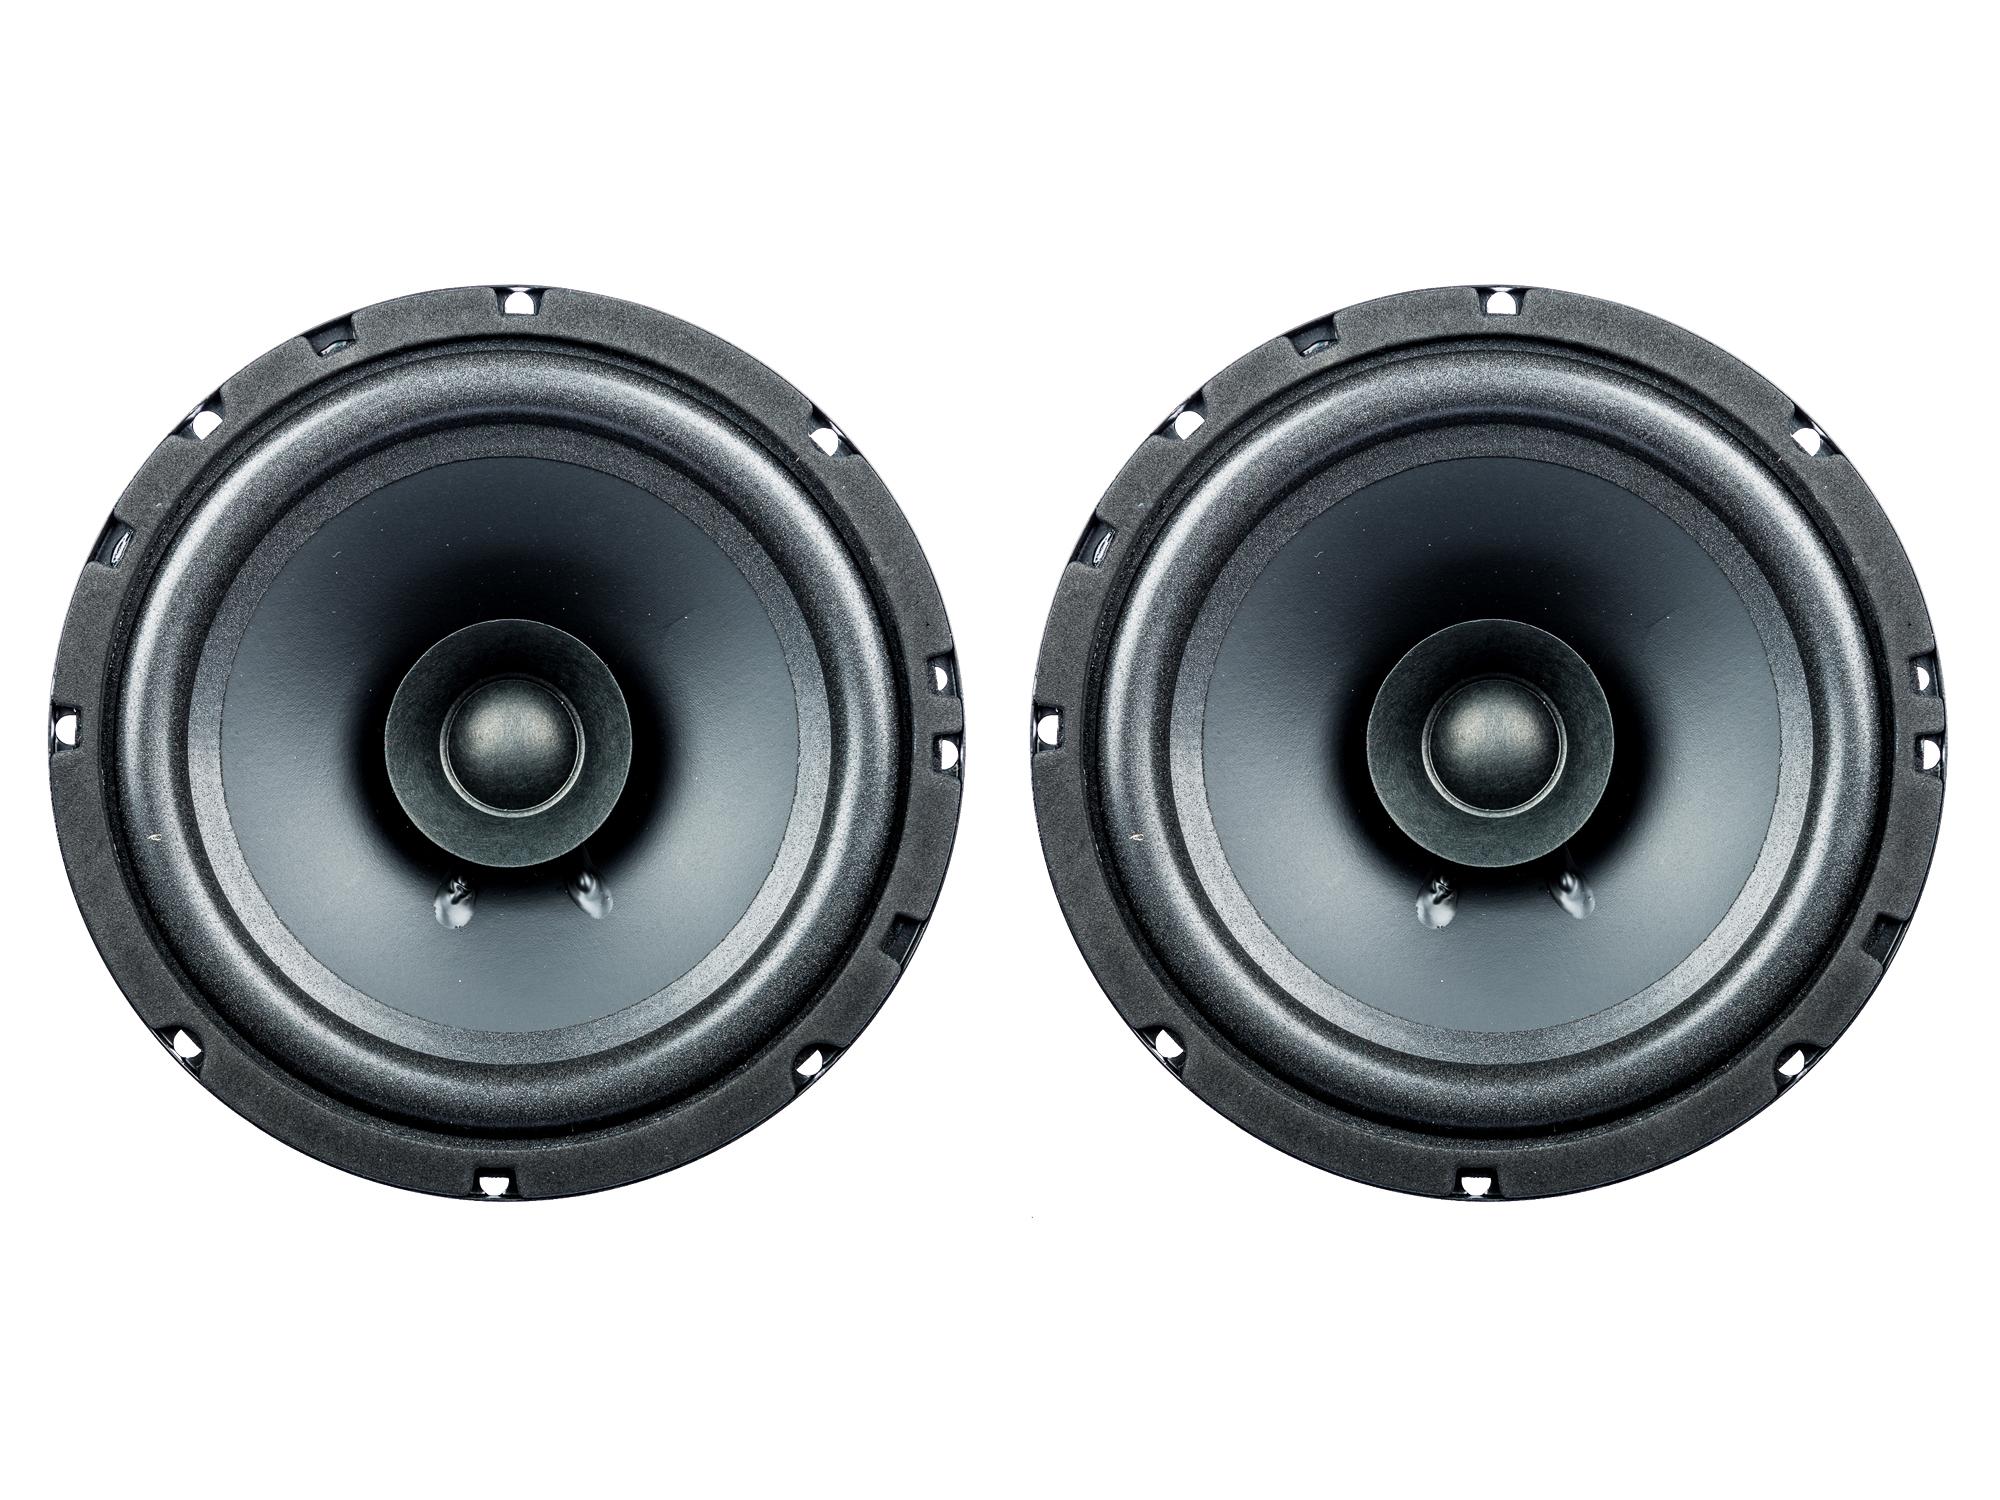 1 Paar PG Audio EVO I 16.2, 16 cm Dual Cone Lautsprecher , Neu-Ware